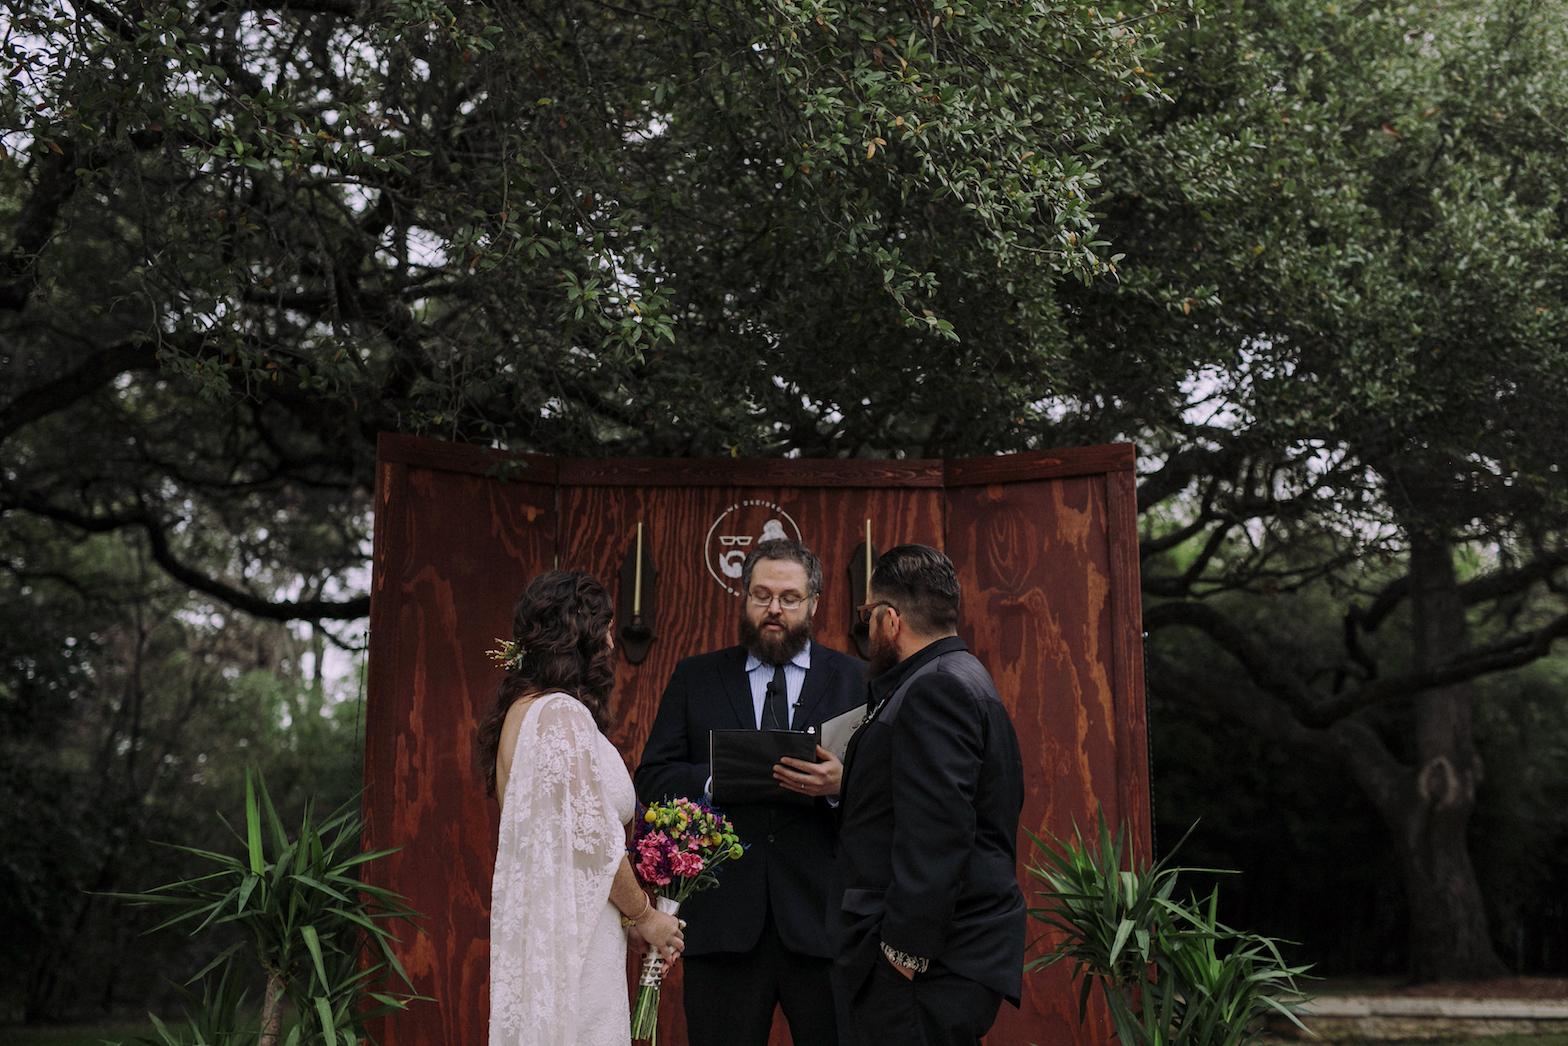 mercury-hall-wedding-austin-texas0102.JPG